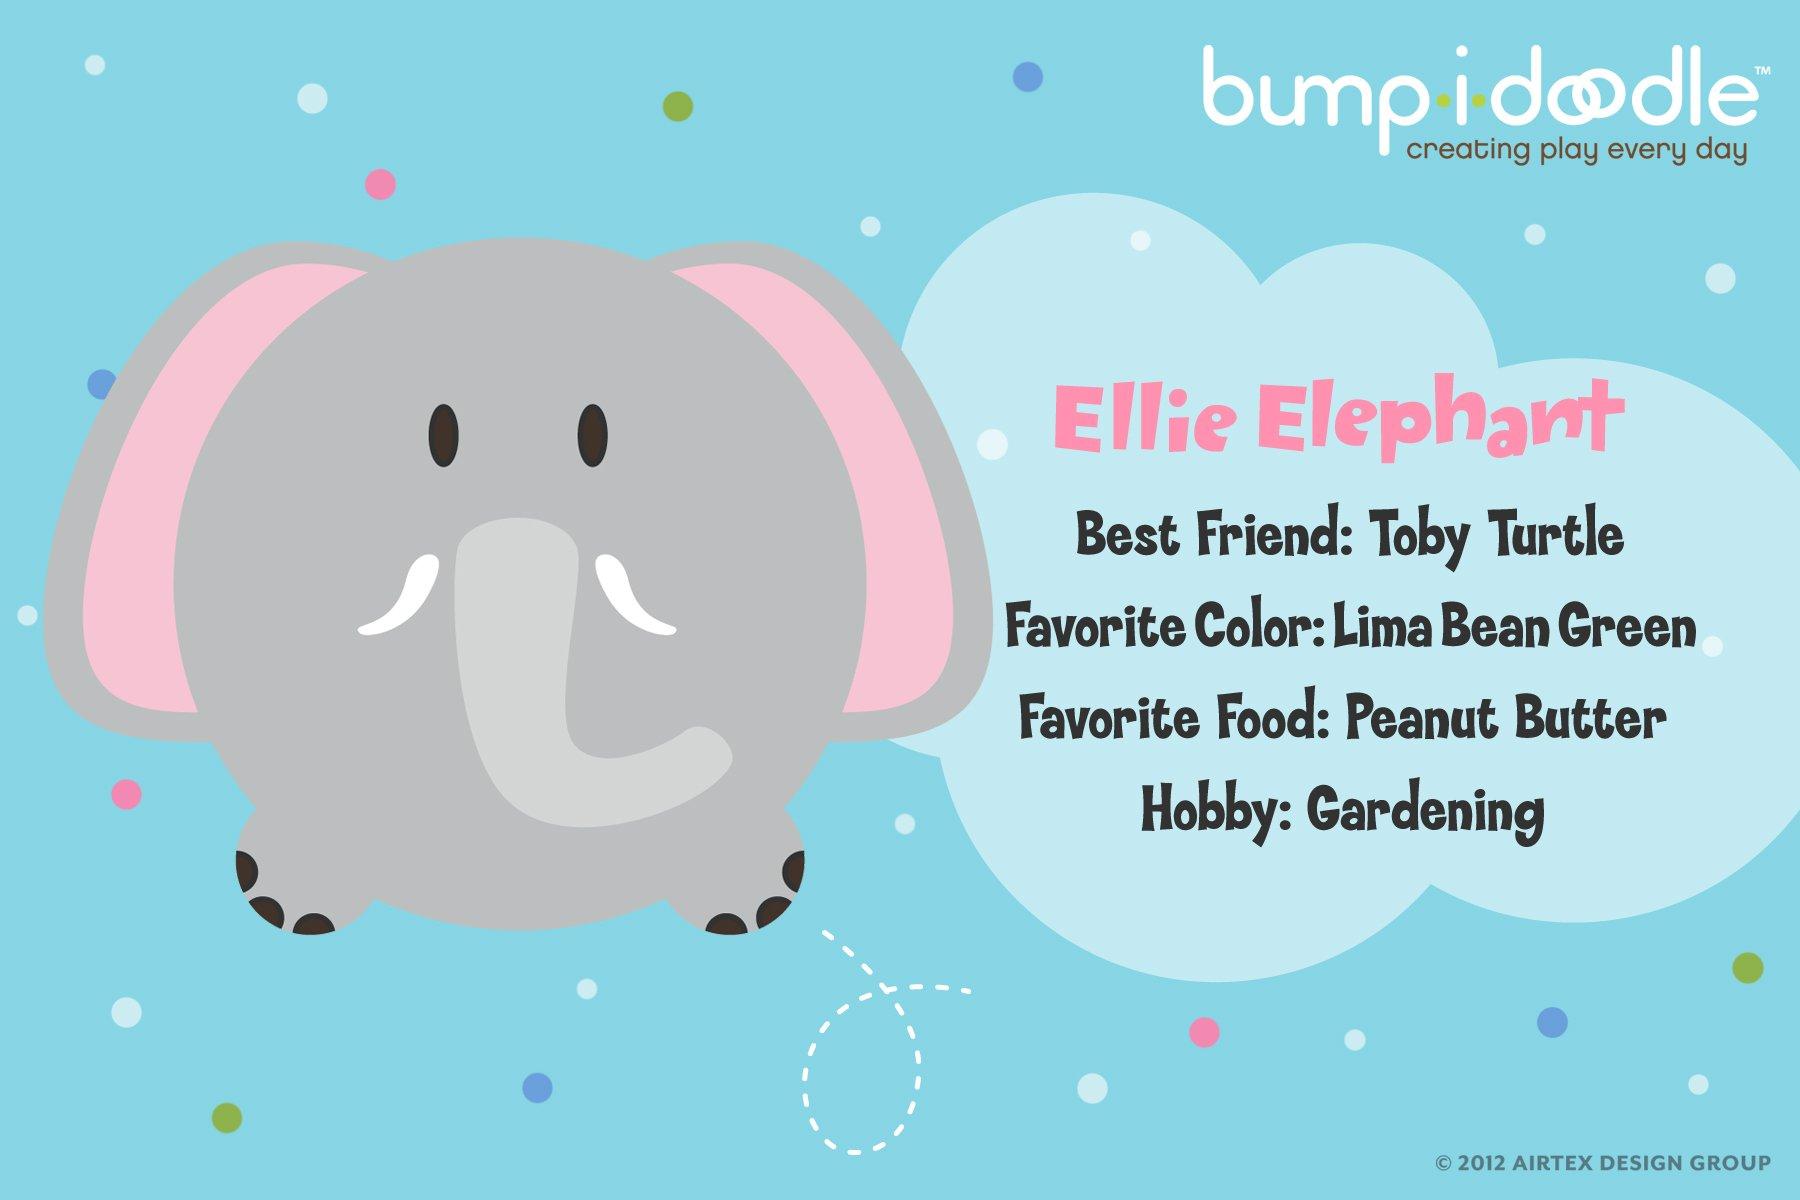 Bumpidoodle Ellie Elephant Bump-i-Doodle Pillow Floor Cushion - 30'' Jumbo Size by Bumpidoodle